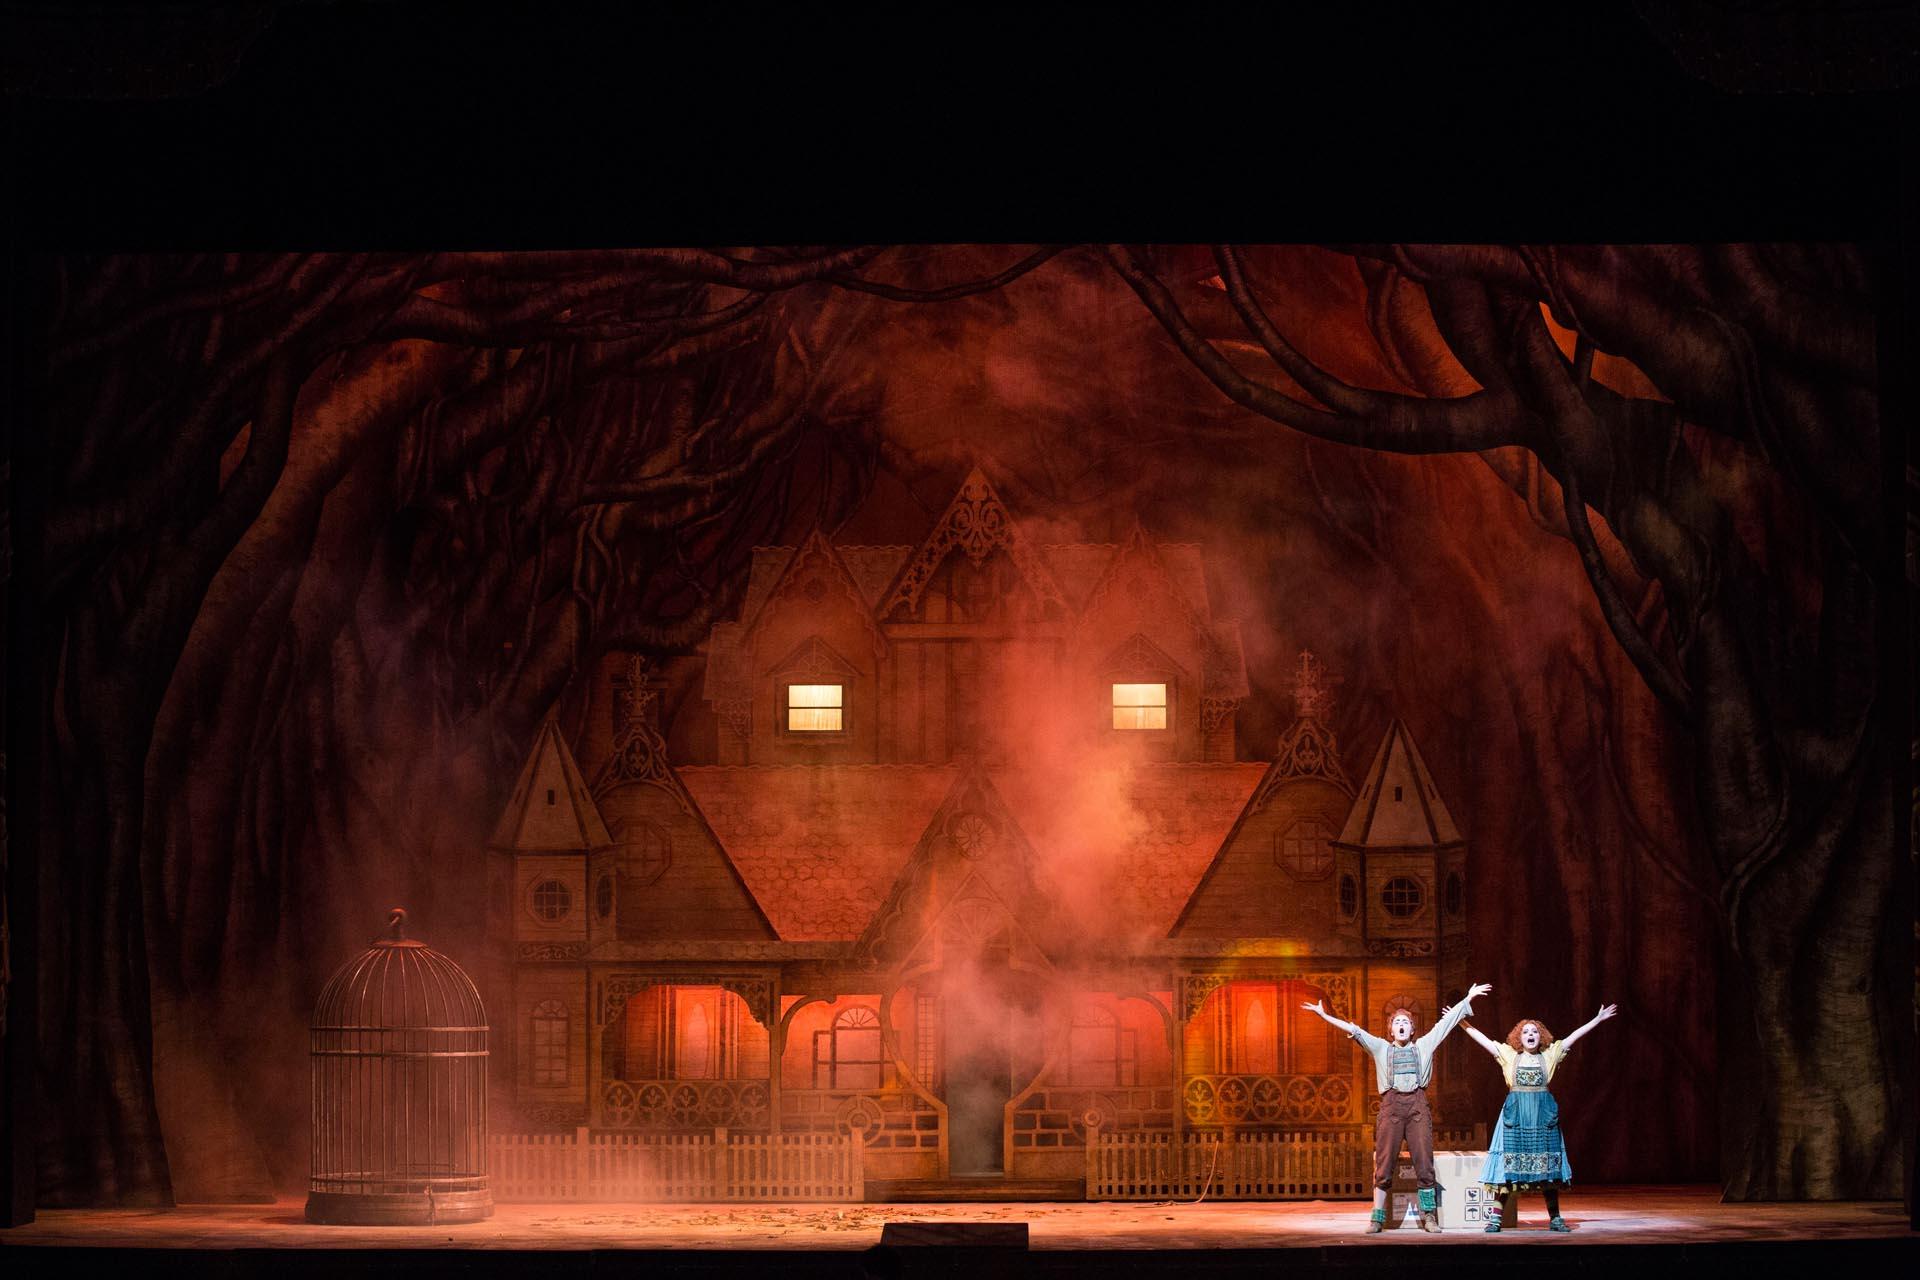 16 Hänsel und Gretel, Teatro alla Scala, 2017, © Brescia und Amisano